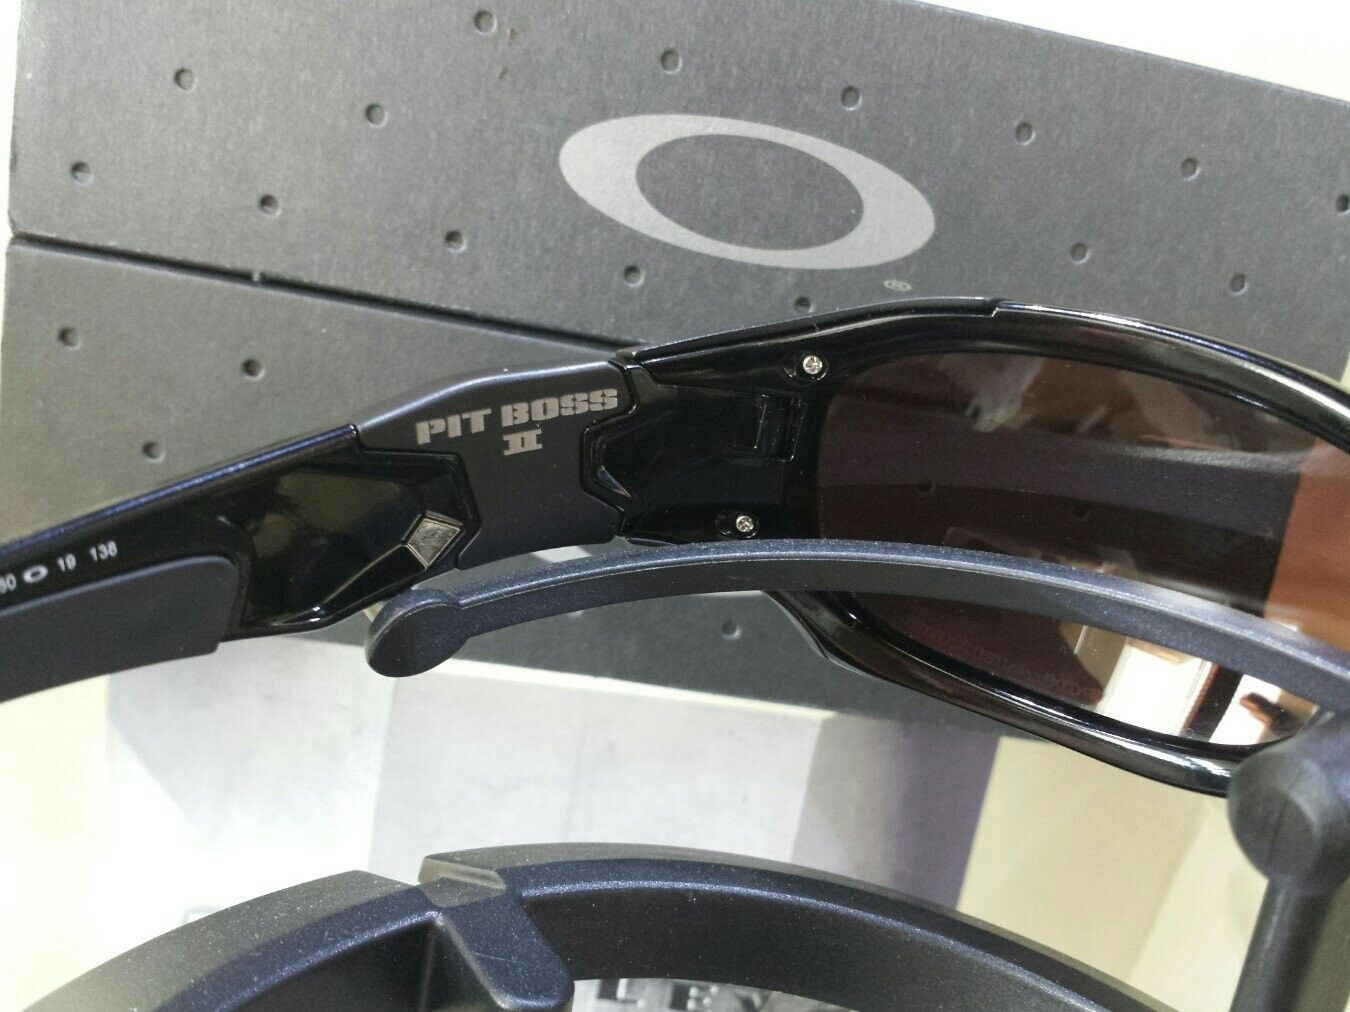 Oakley Pit Boss II - $275 - pasavyvu.jpg